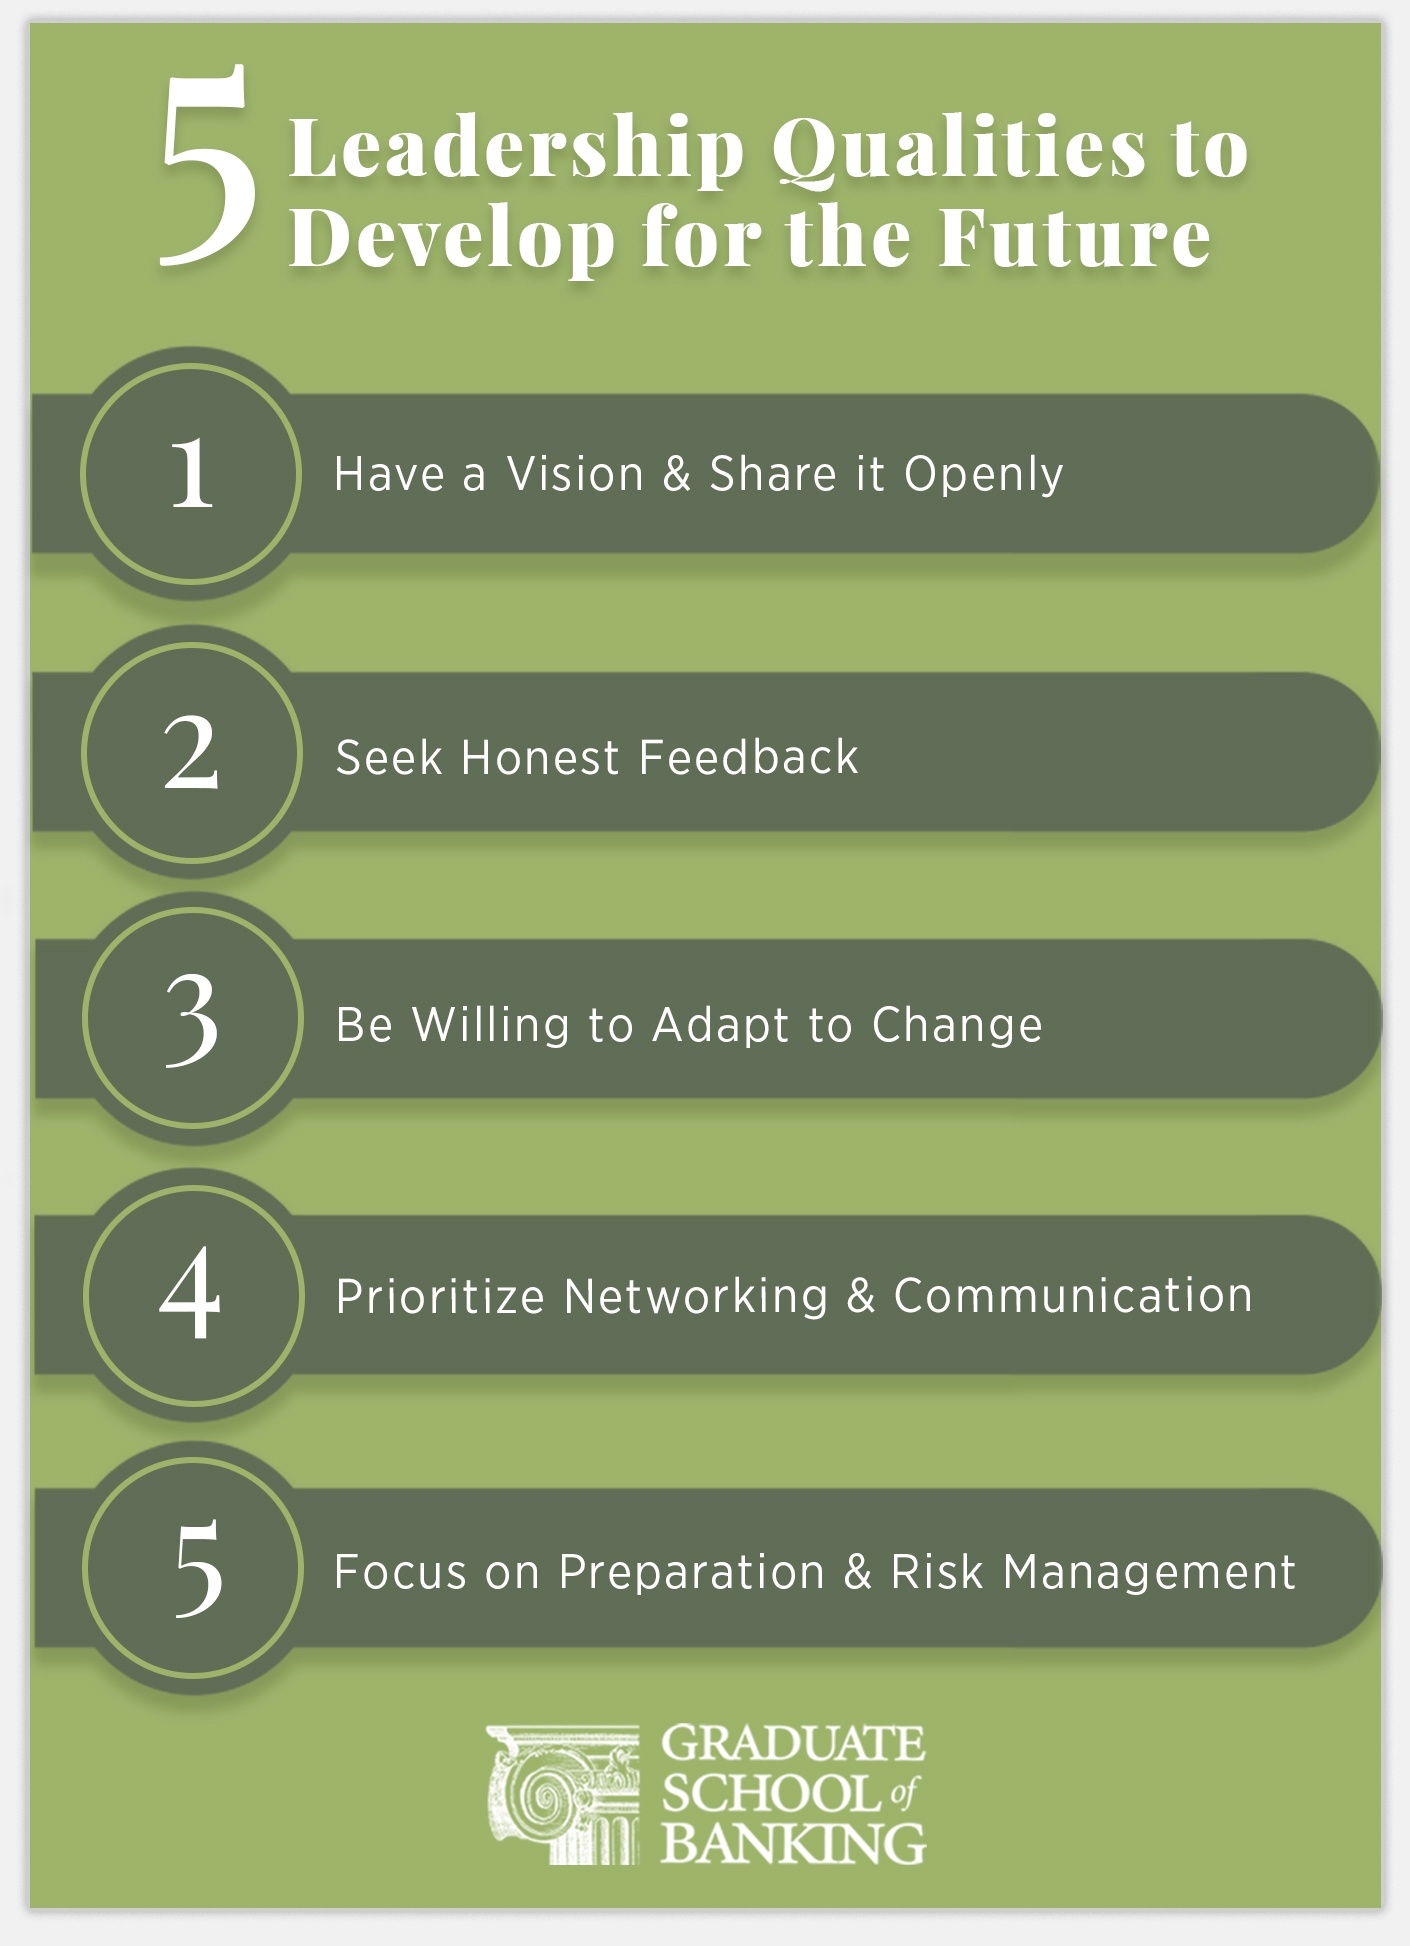 leadership qualities infographic